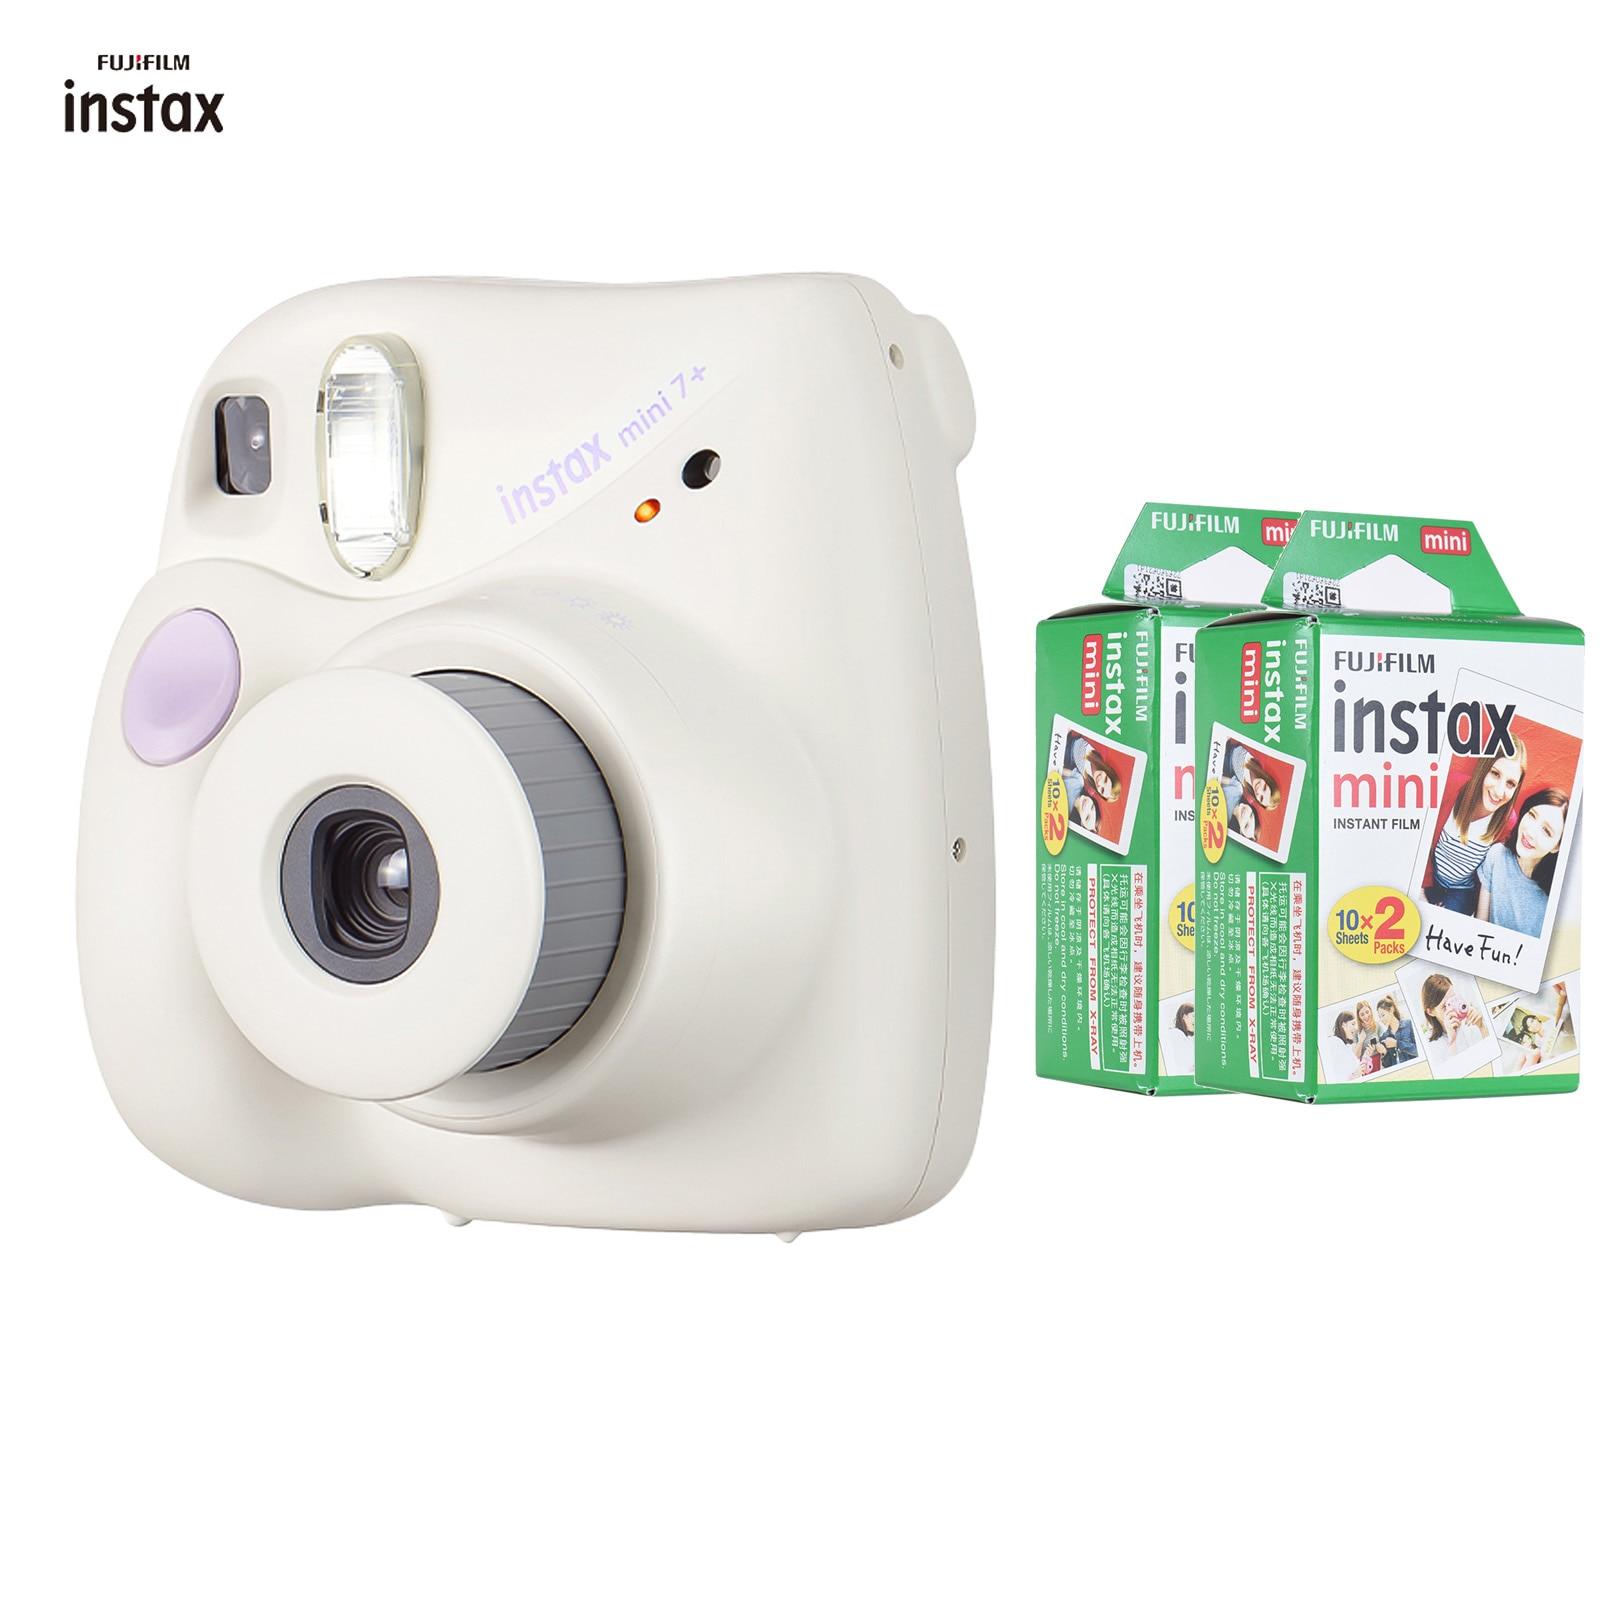 Fujifilm Instax Mini 7 + mini7 + كاميرا فورية فيلم كام التركيز التلقائي شريط للرسغ عيد الميلاد السنة الجديدة مهرجان هدية كما Mini 9 11